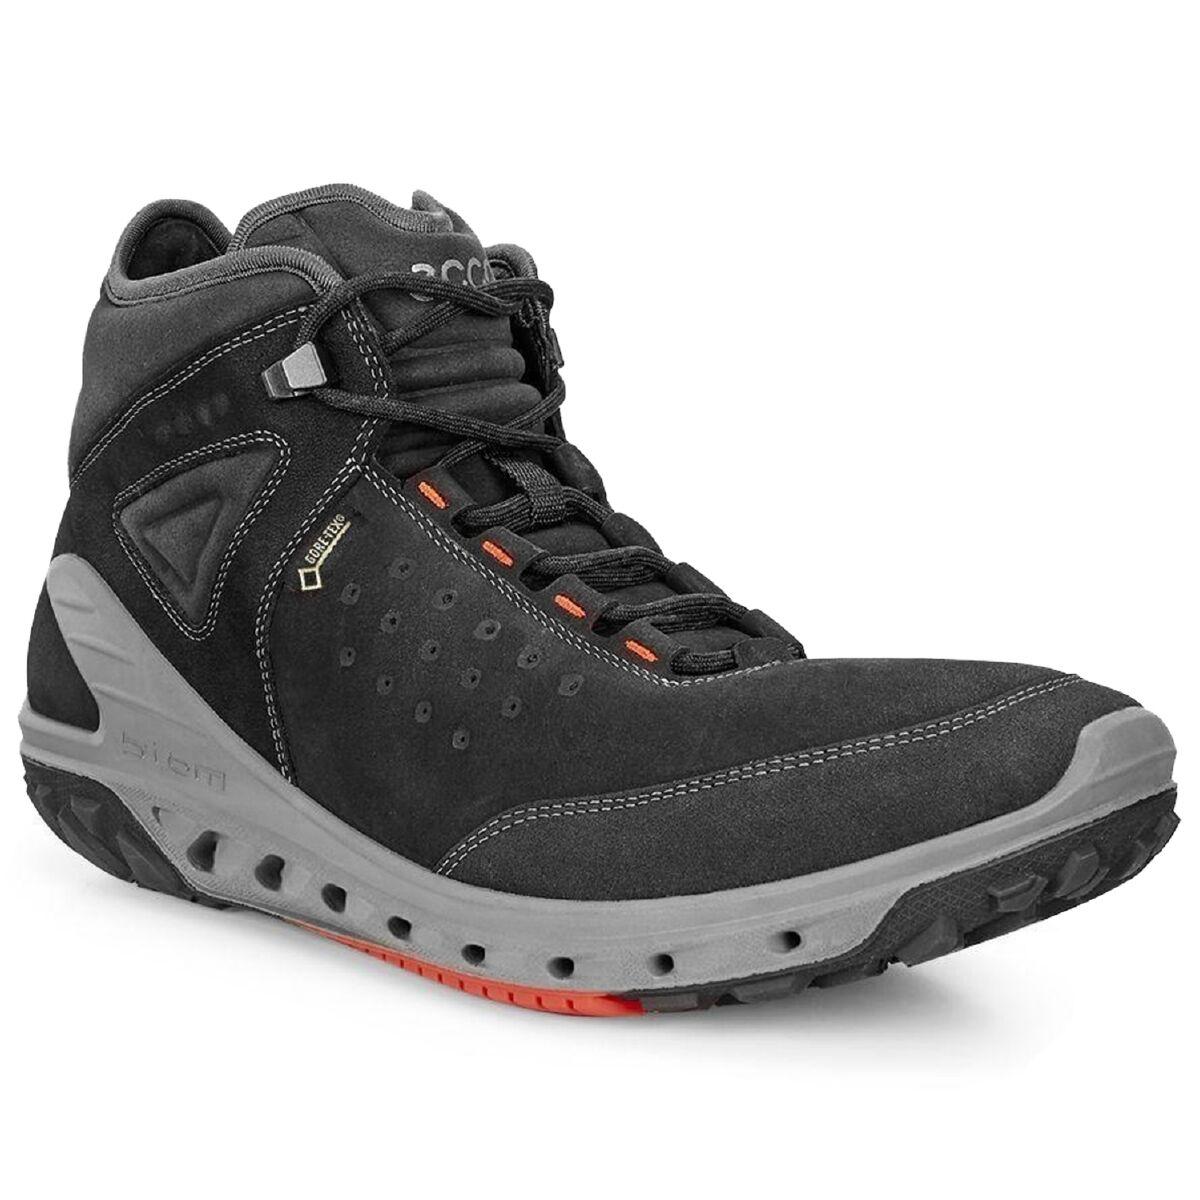 Ecco Biom Venture Venture Venture Mid GTX Men Herren Gore-Tex Schuhe Natural Motion 820734-51707 5477a0